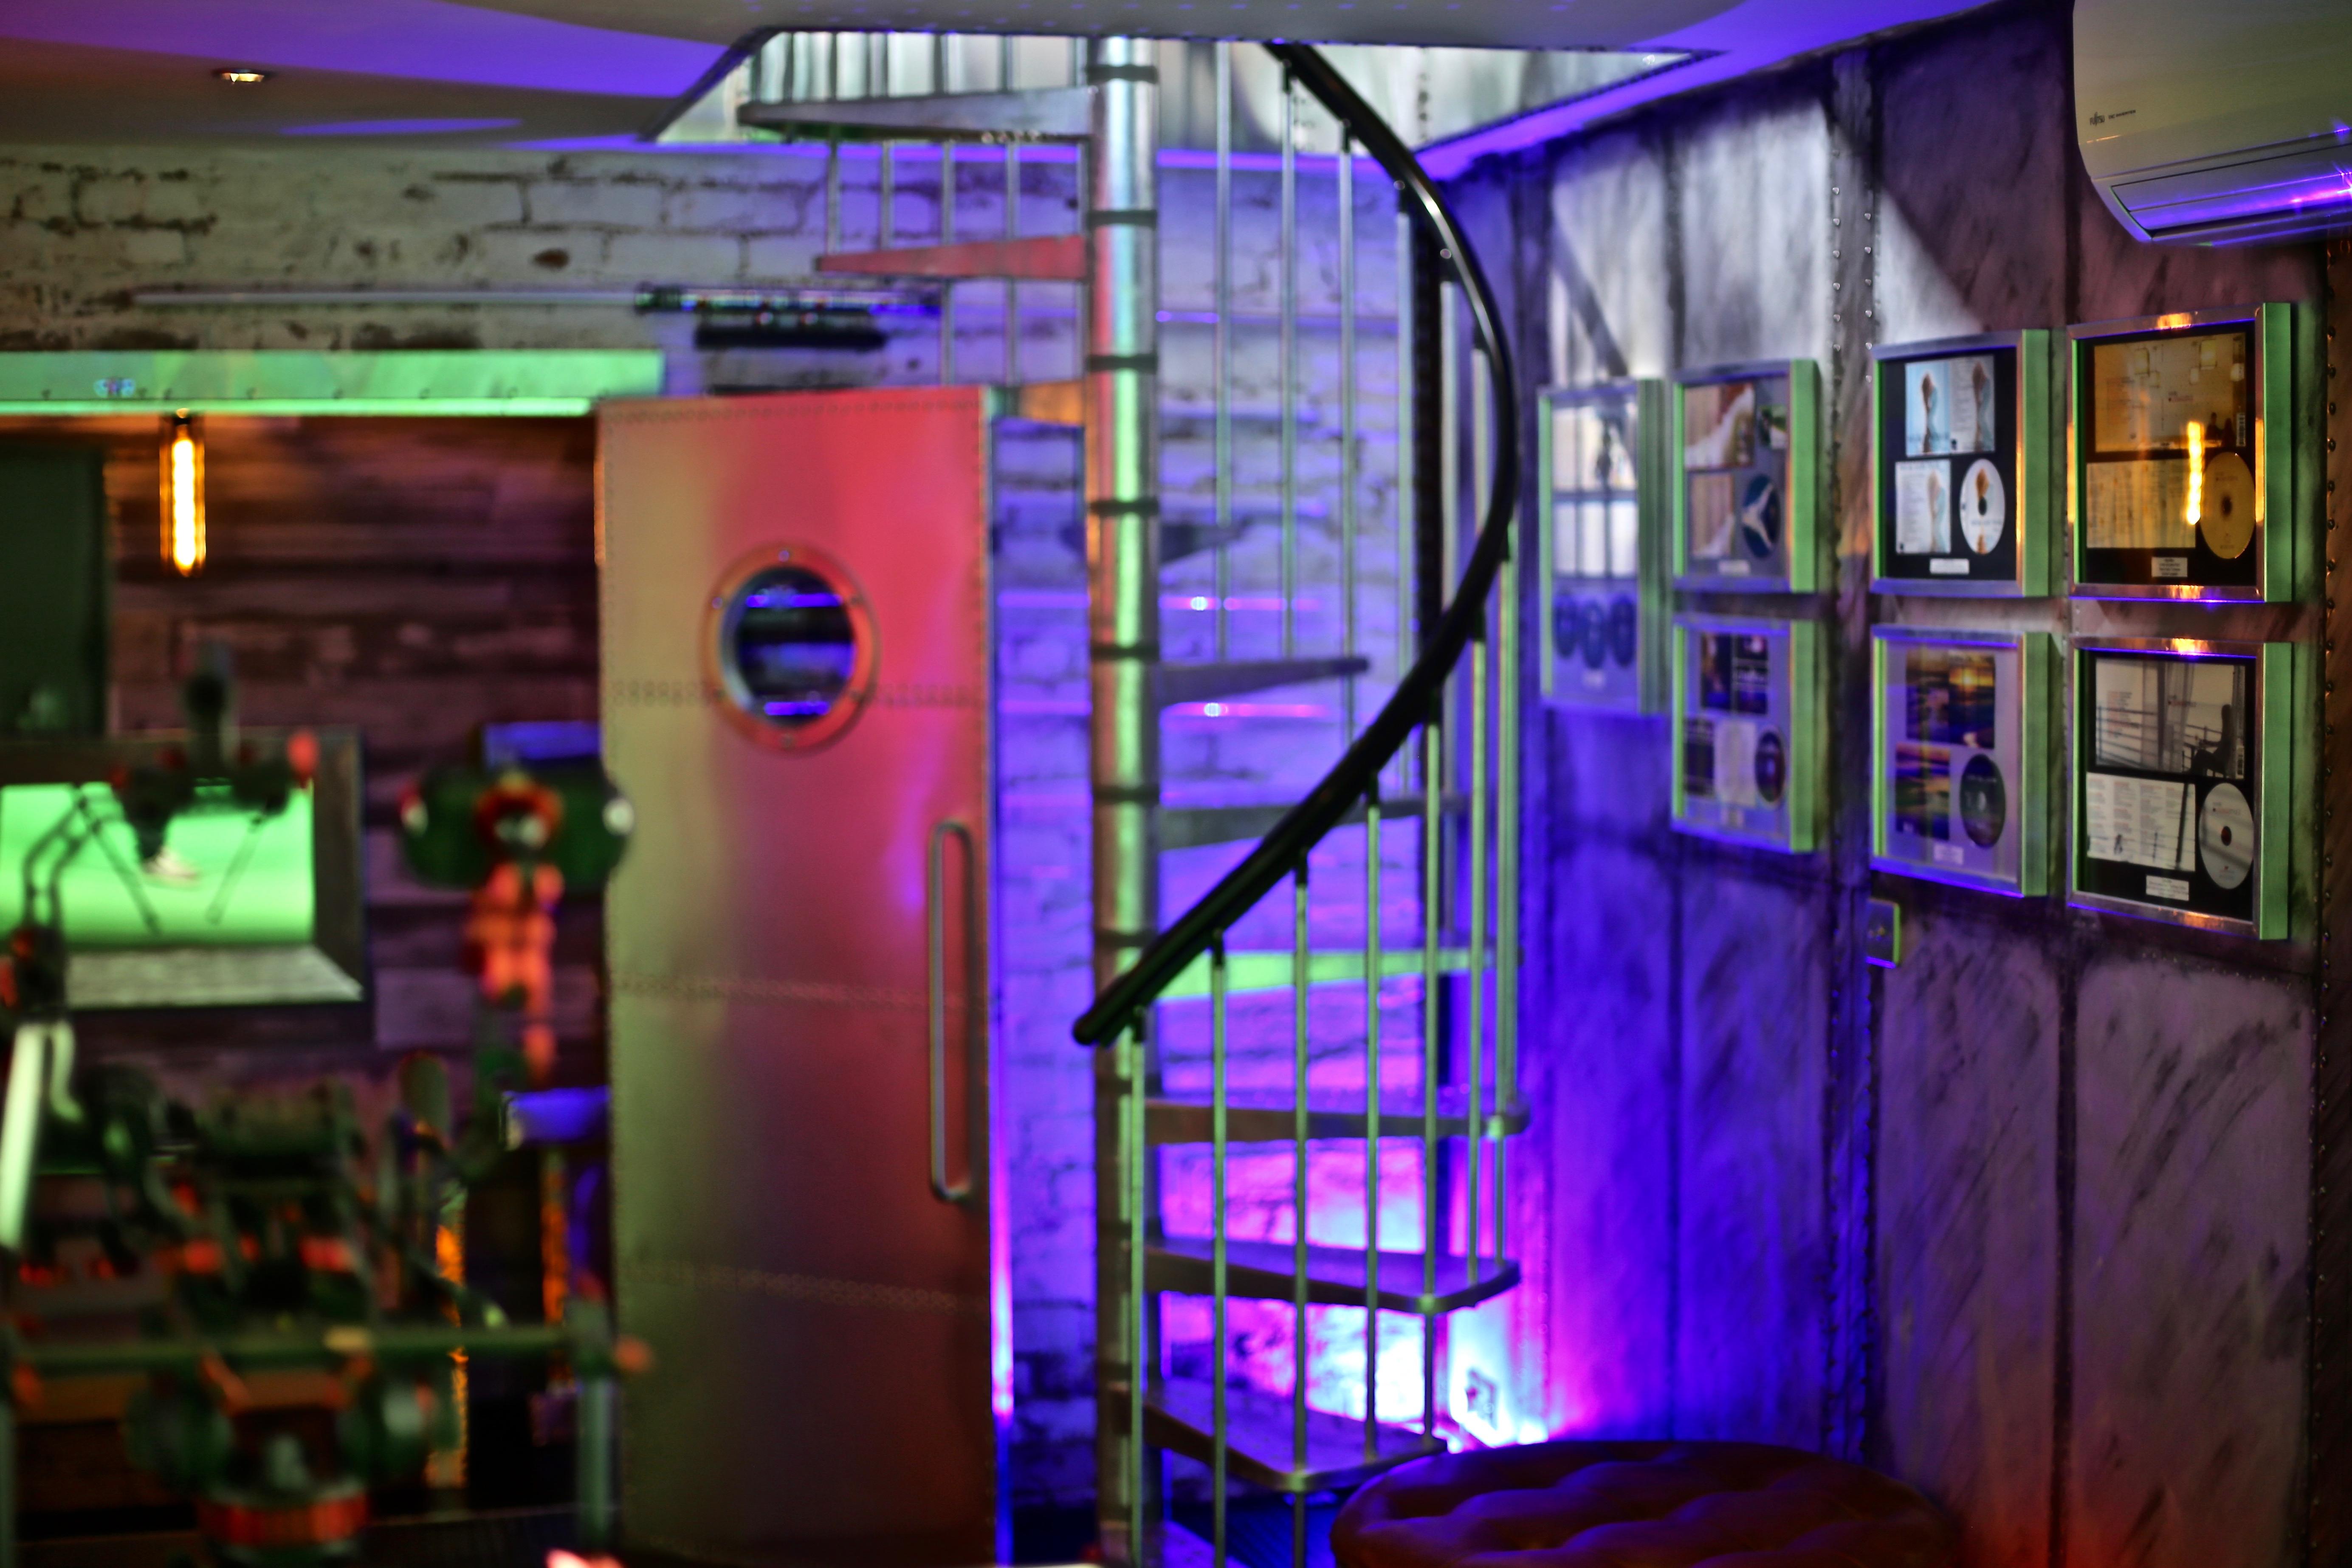 7Gate Media_Silver Studios - Spiral Staircase shot 4